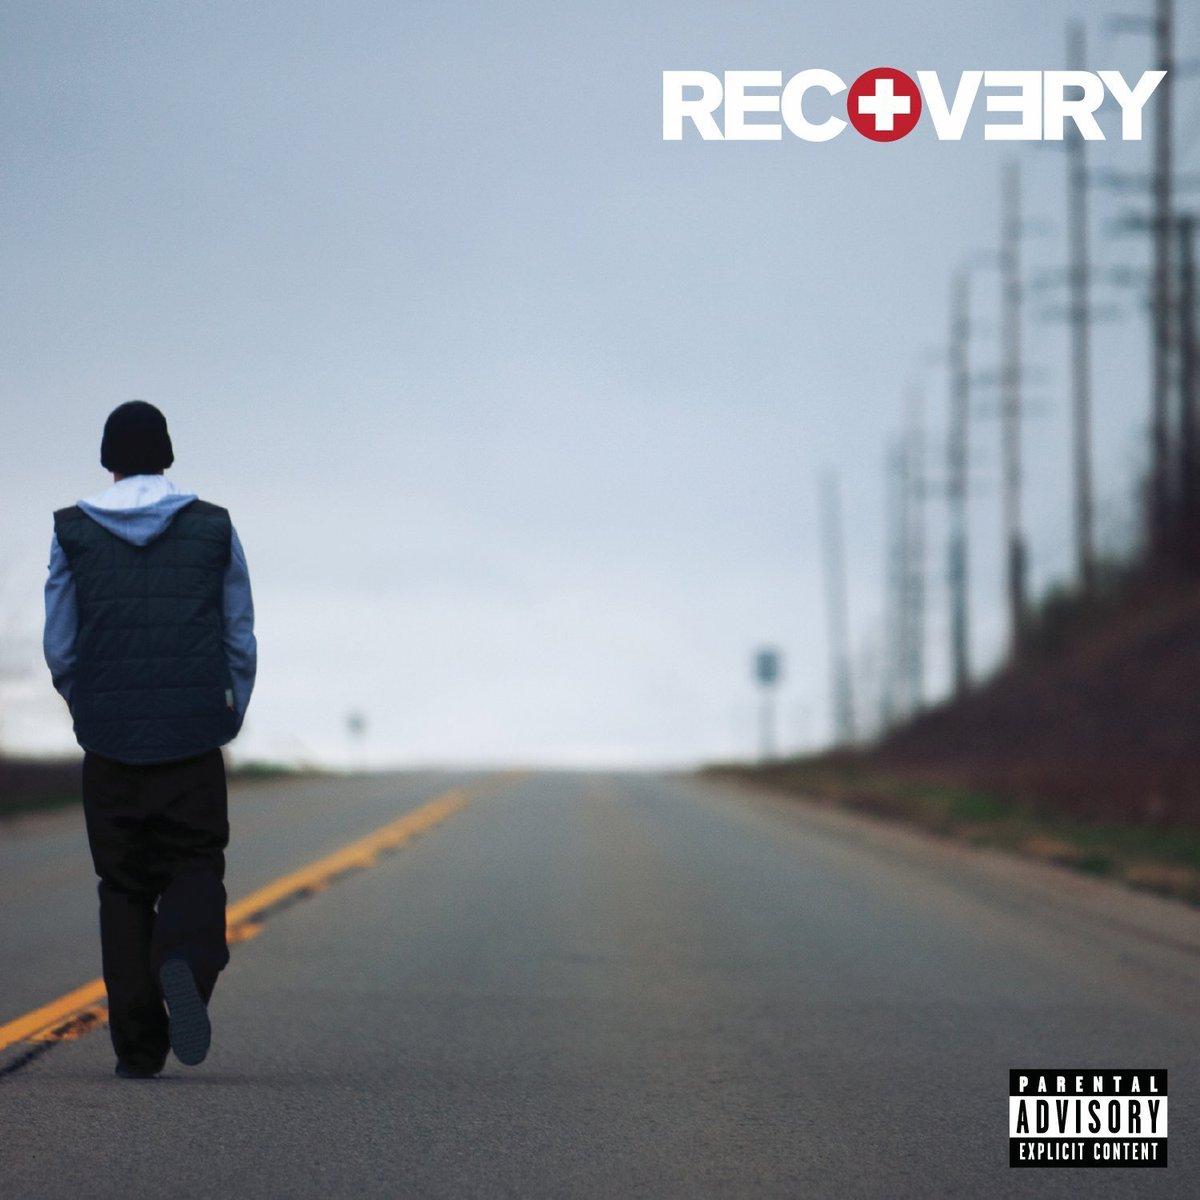 2Moro June 18 we celebrate #Recovery on its release date - Grammy winning/Multi-Platinum album by the Boss @Eminem https://t.co/5Dzwtq6ZVS